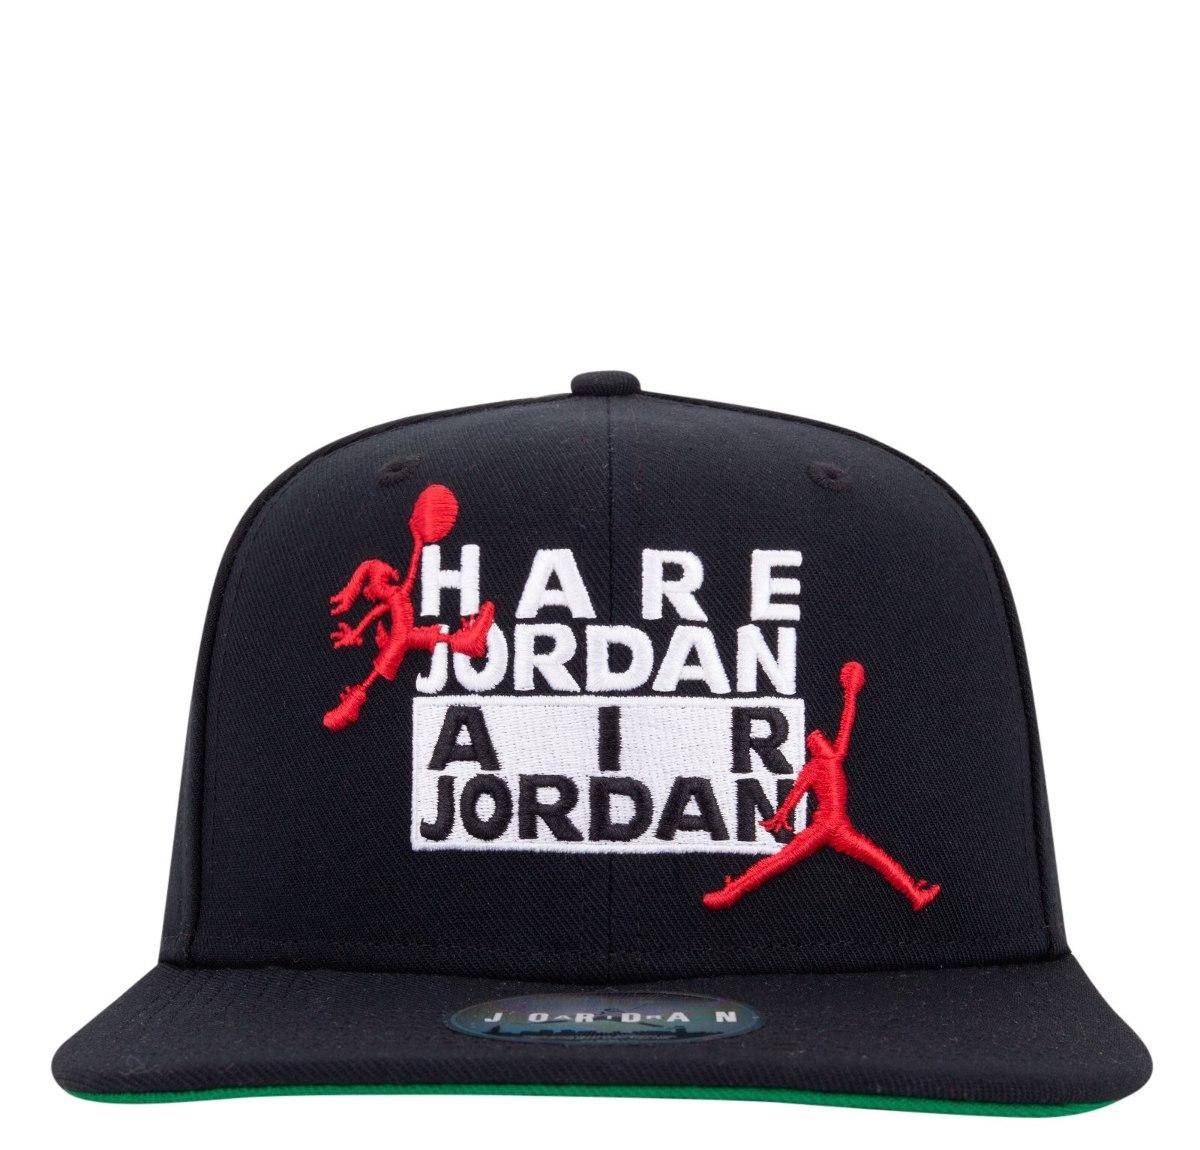 2dbaad56f66c0 Gorra Cap Swag Nike Hare Jordan Air Jordan -   650.00 en Mercado Libre